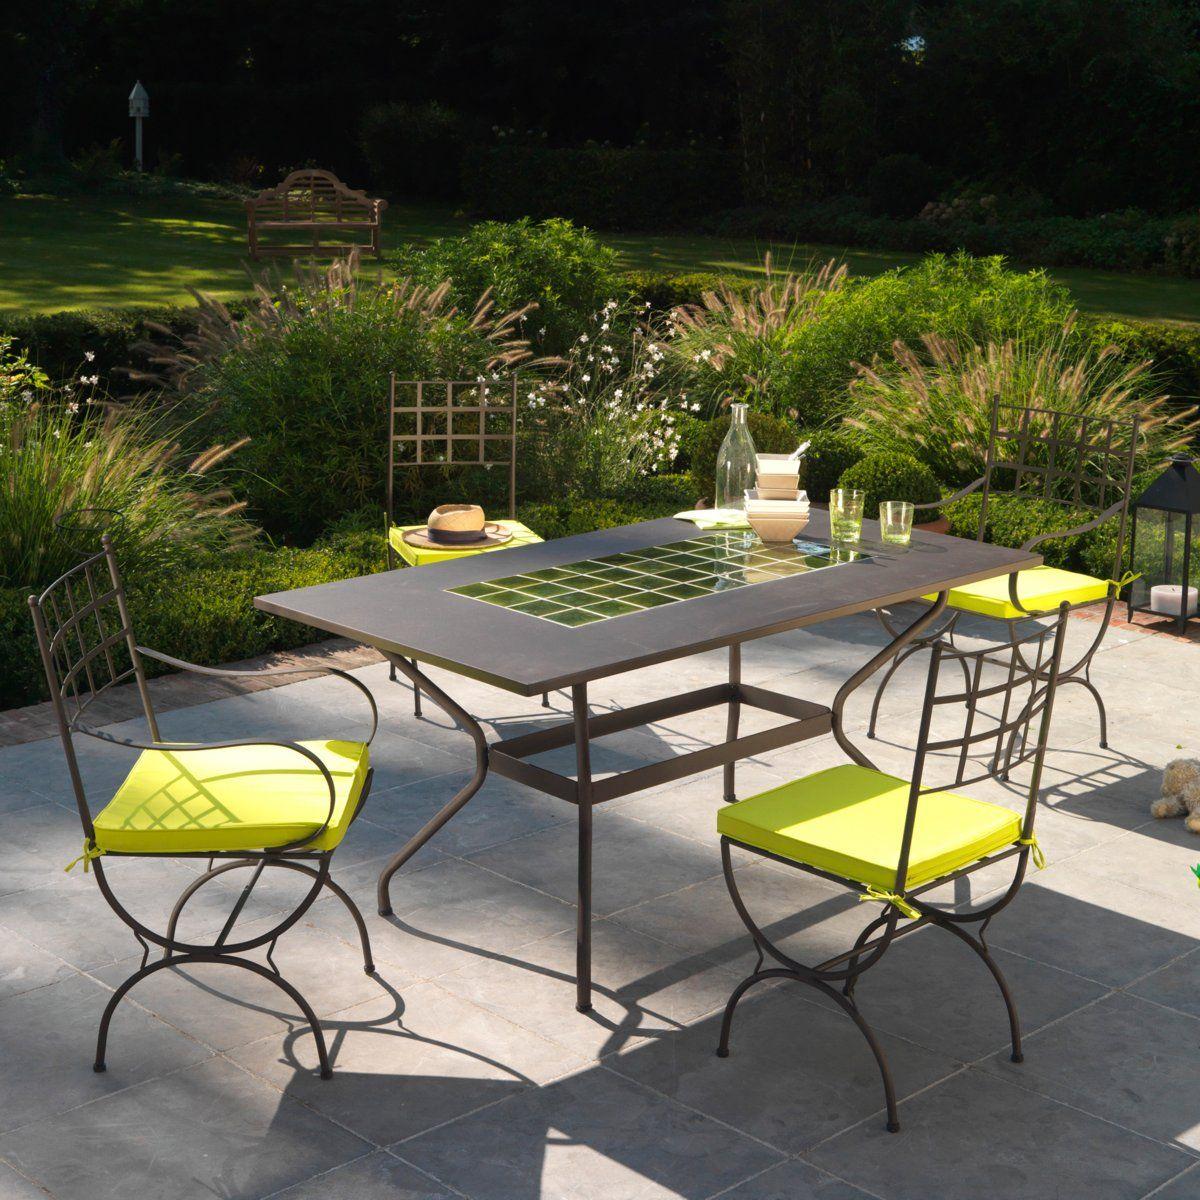 Table De Jardin La Redoute - Table De Jardin Fer Forgé Et ... à Table De Jardin En Fer Forgé Pas Cher